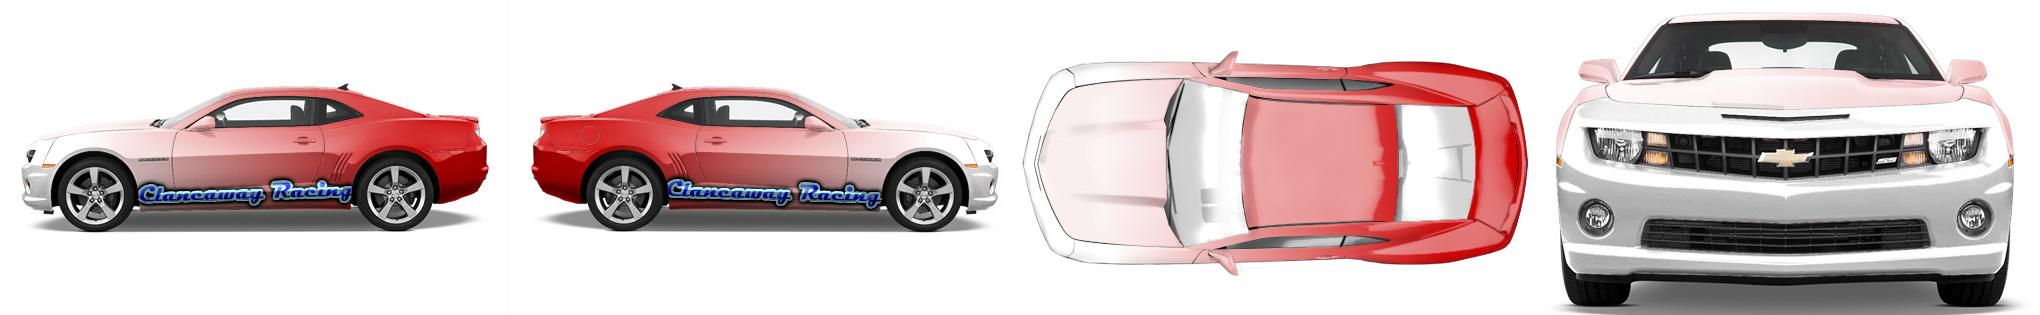 Muscle Car Wrap #537